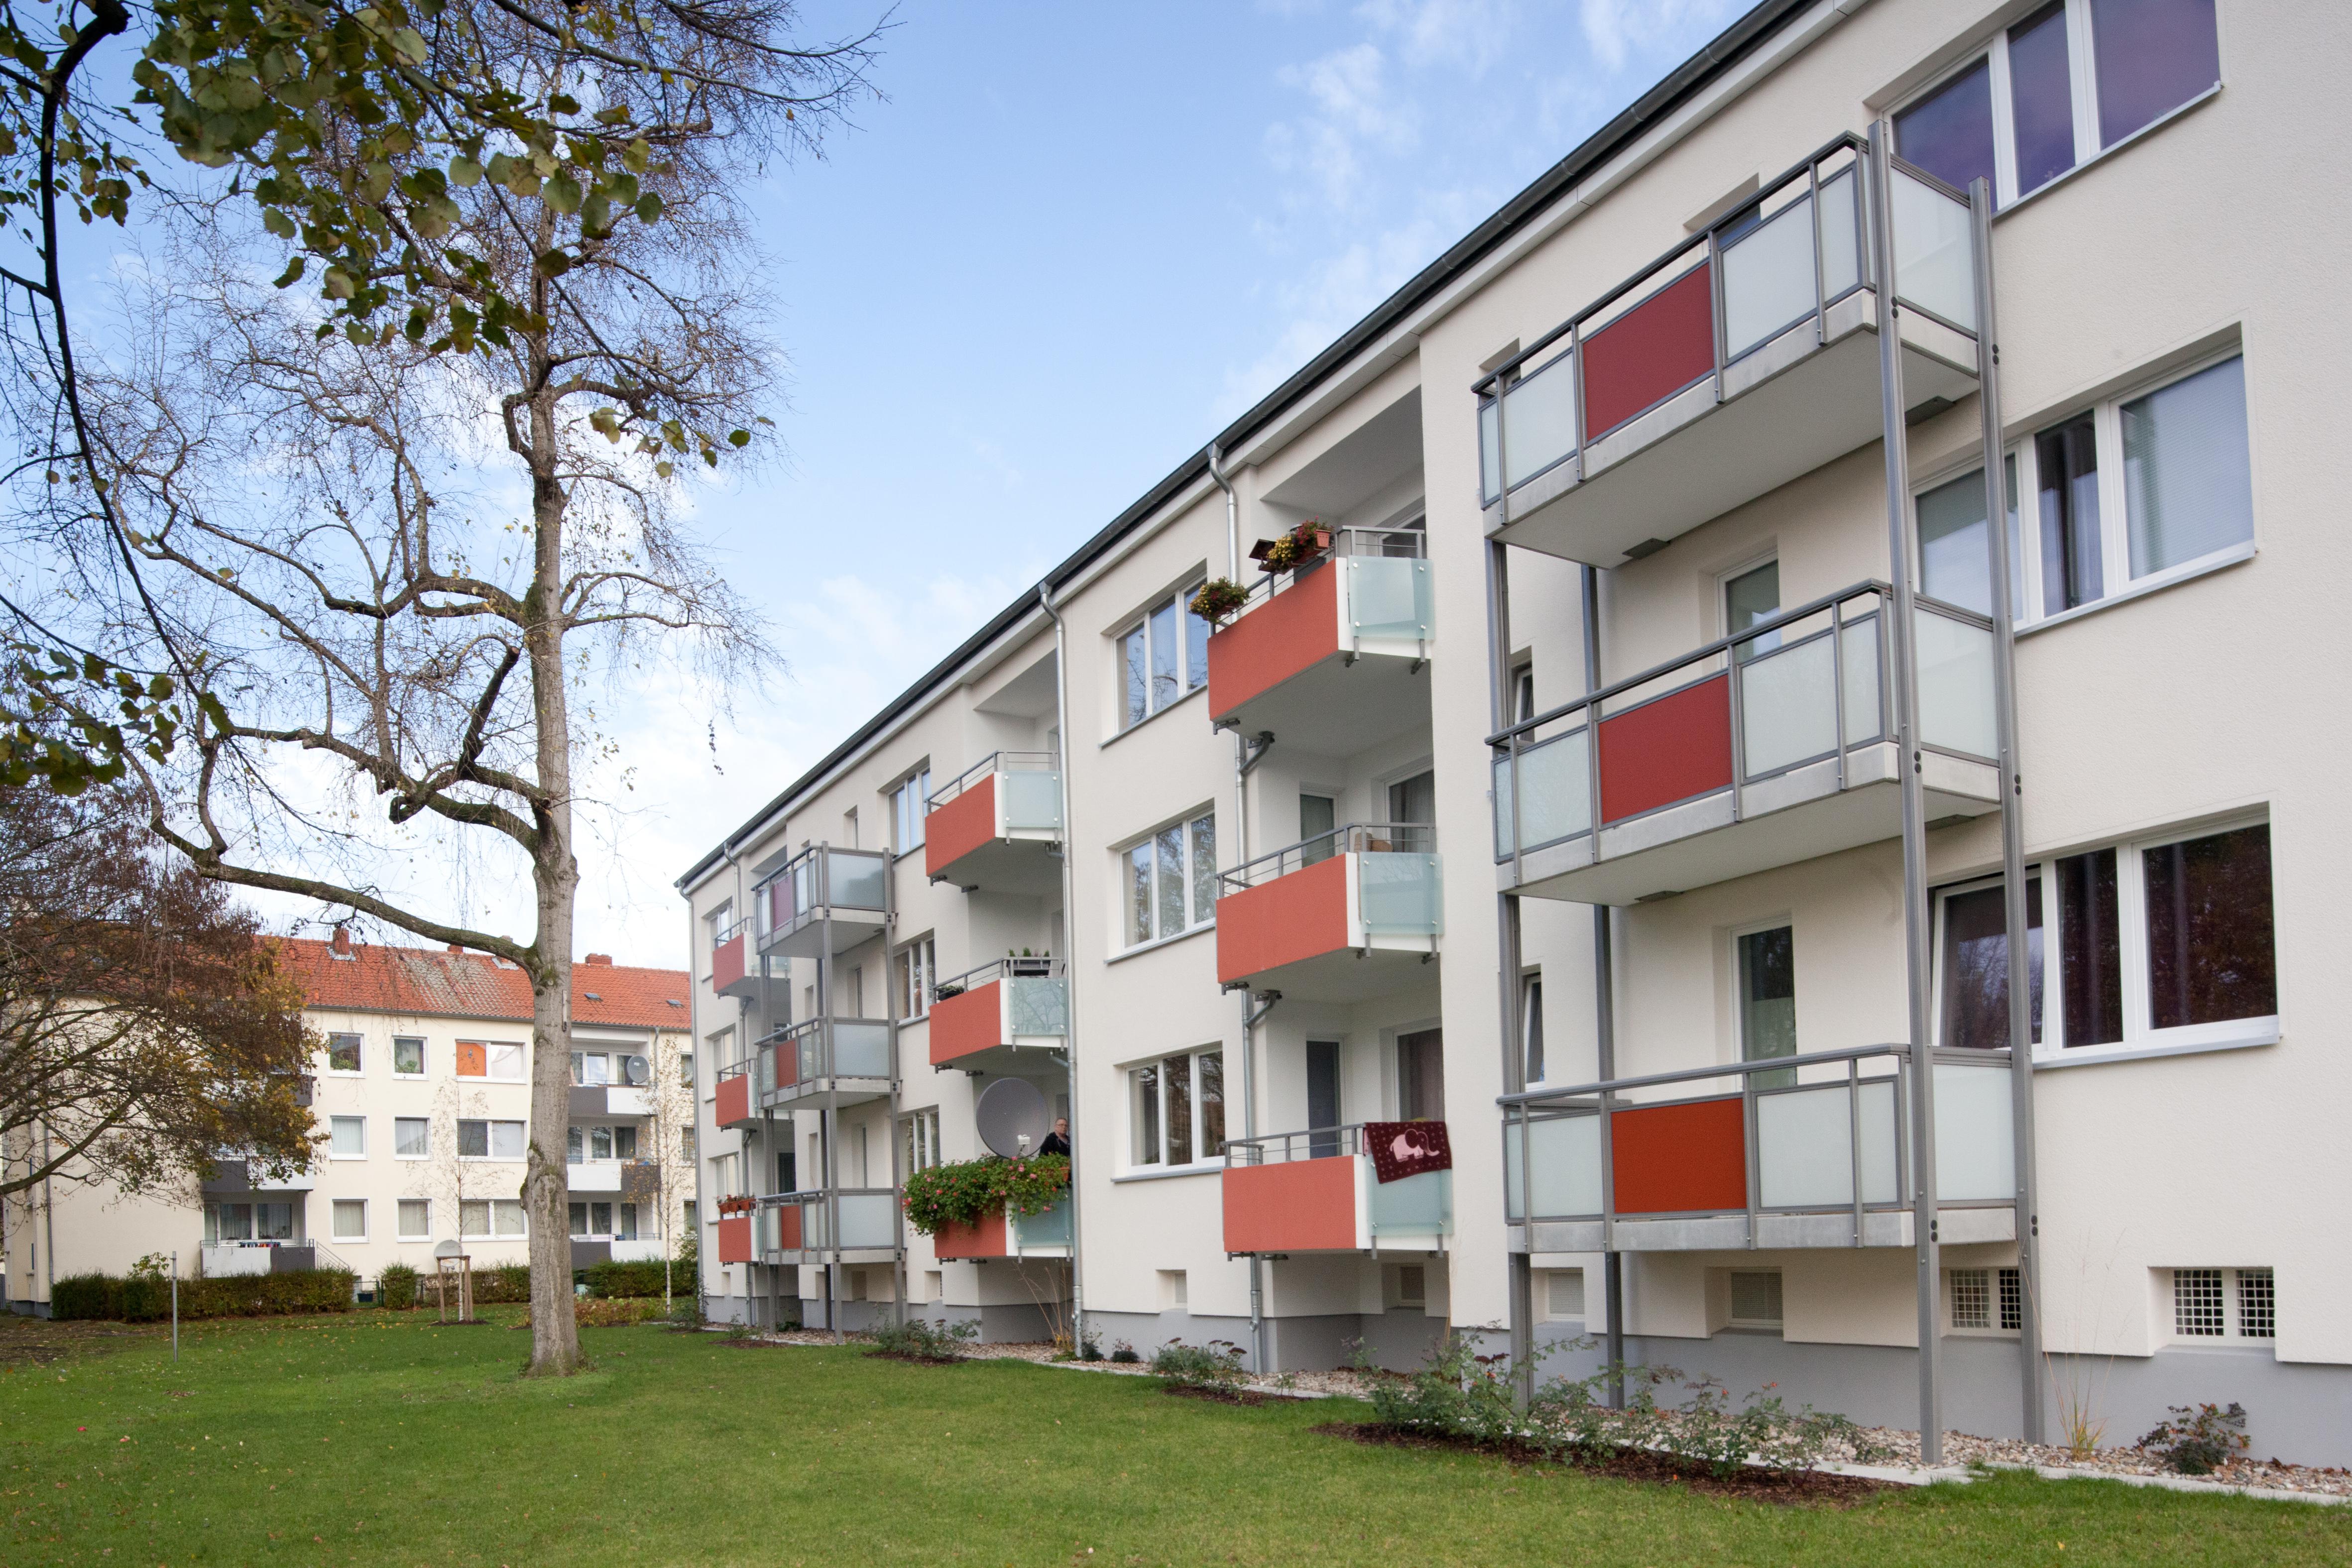 Wohngebäude Hannover, Magdeburger Straße